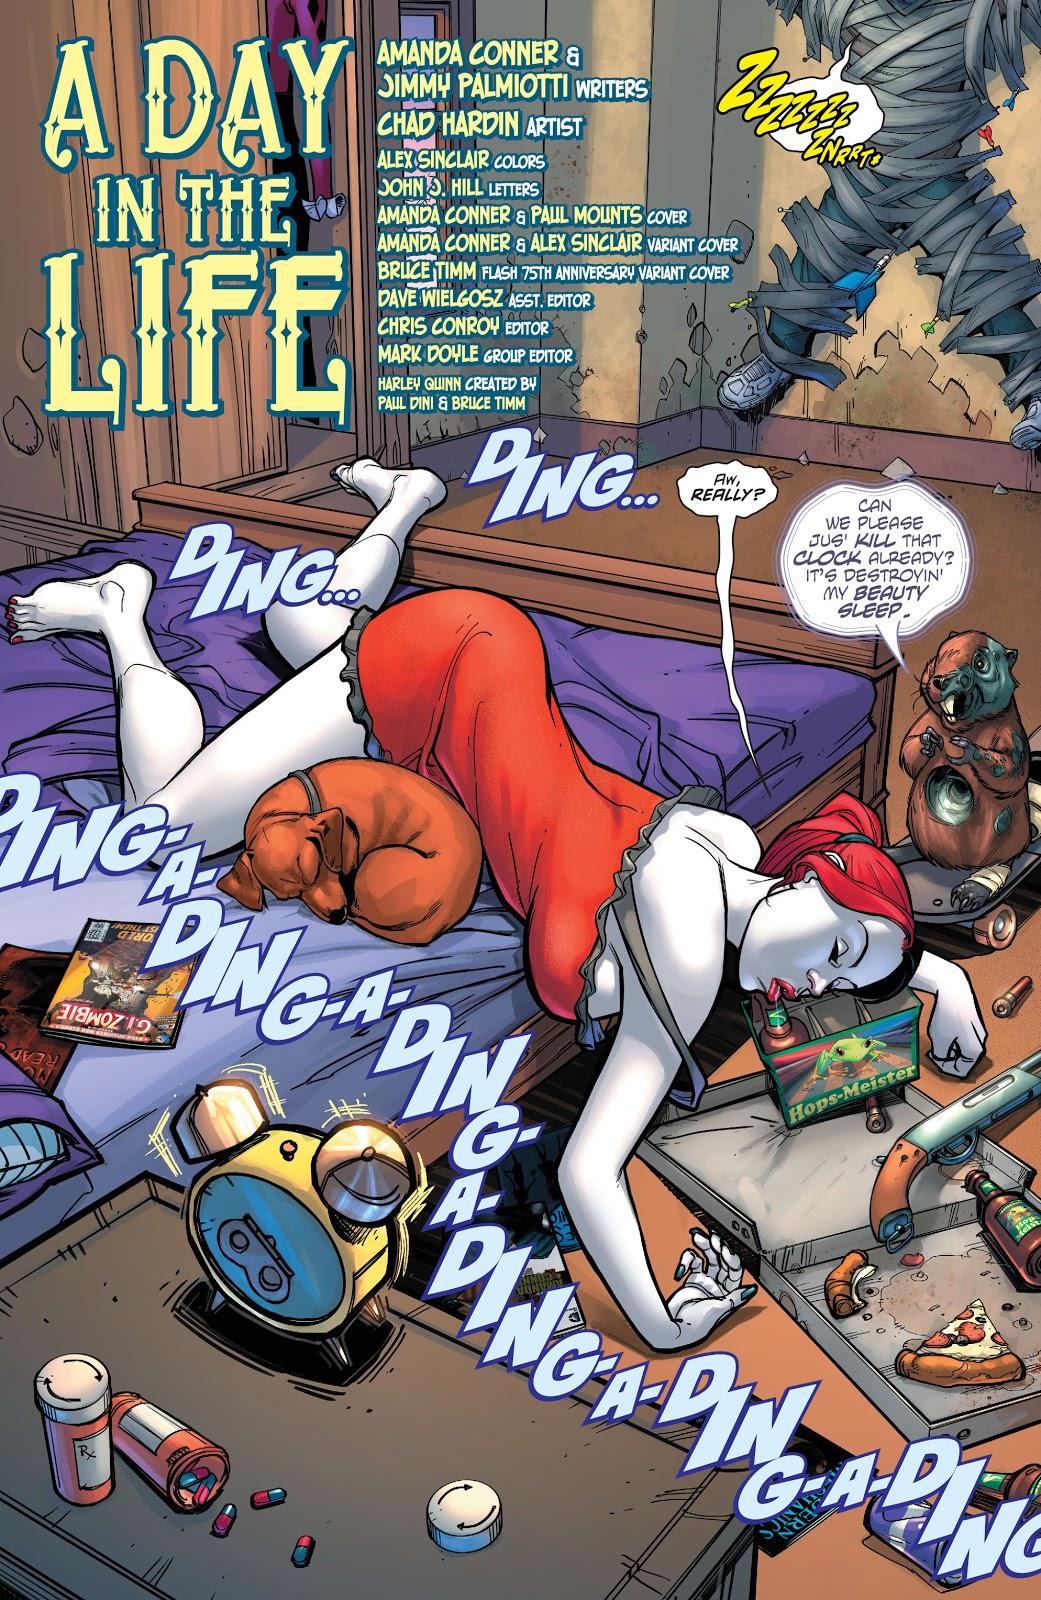 Harley Quinn Vol. 2 #14